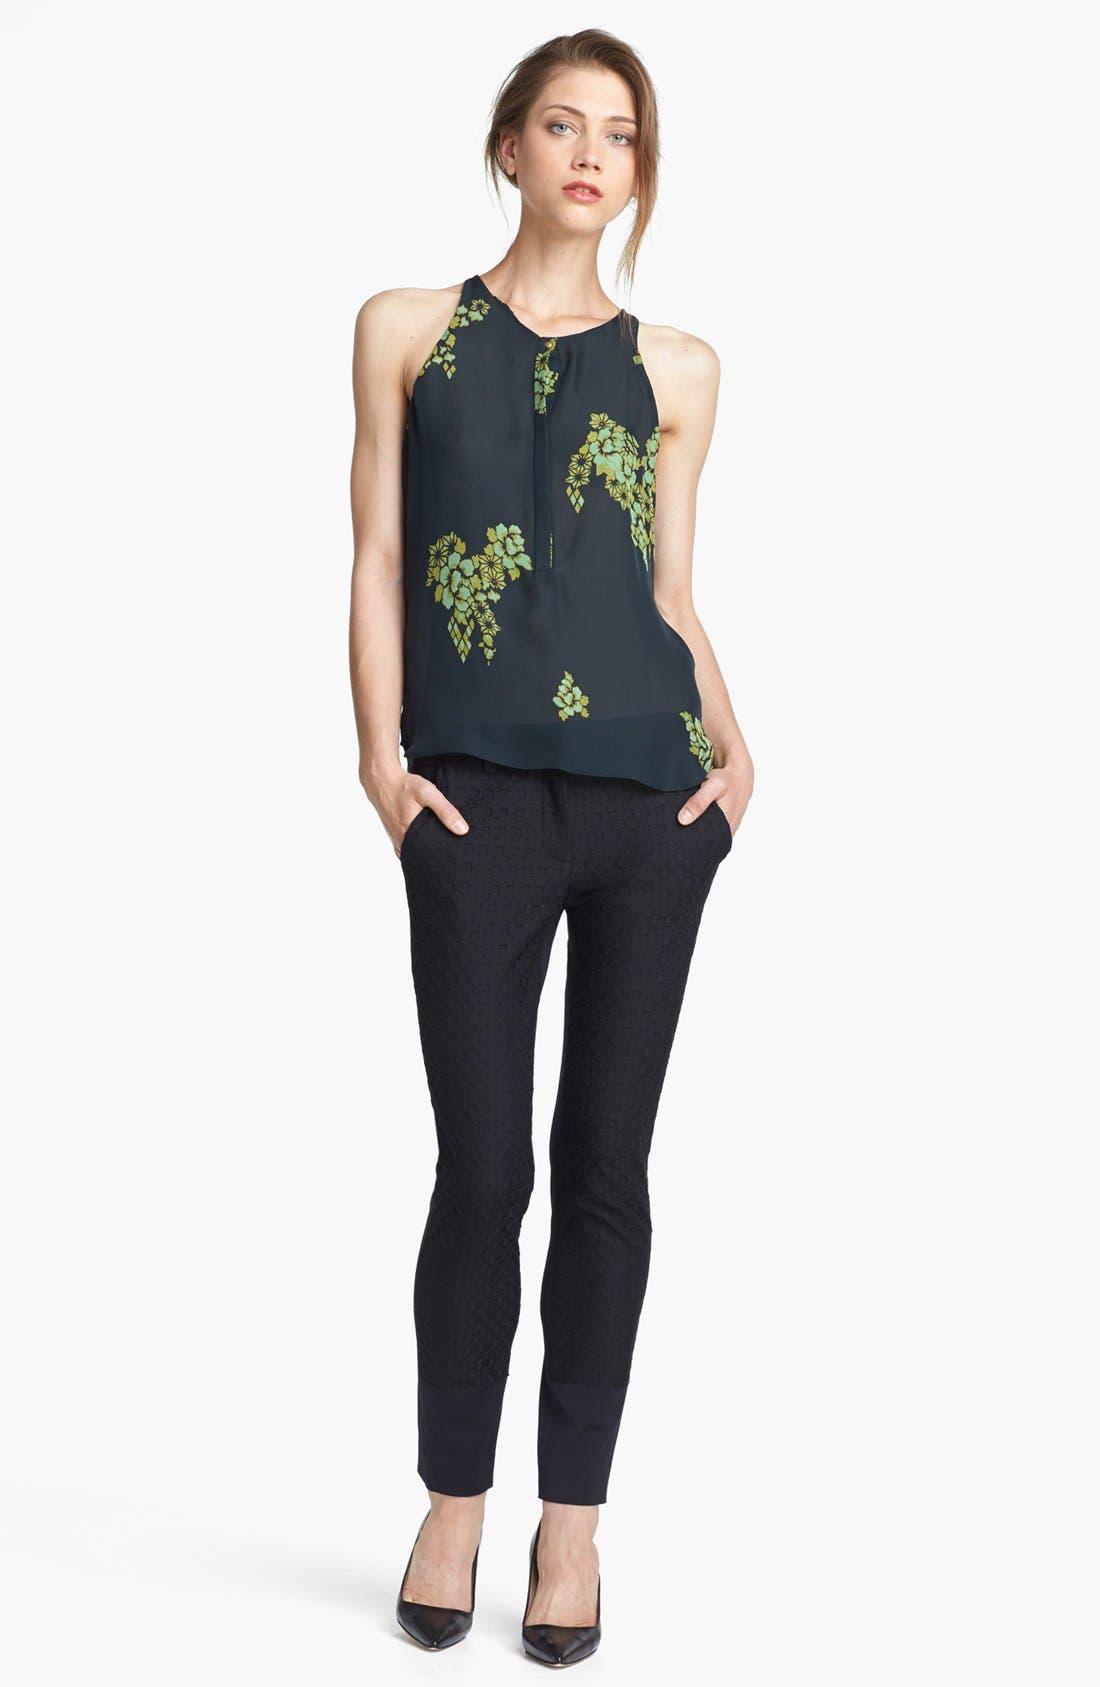 Alternate Image 1 Selected - A.L.C. 'Lennox' Floral Top